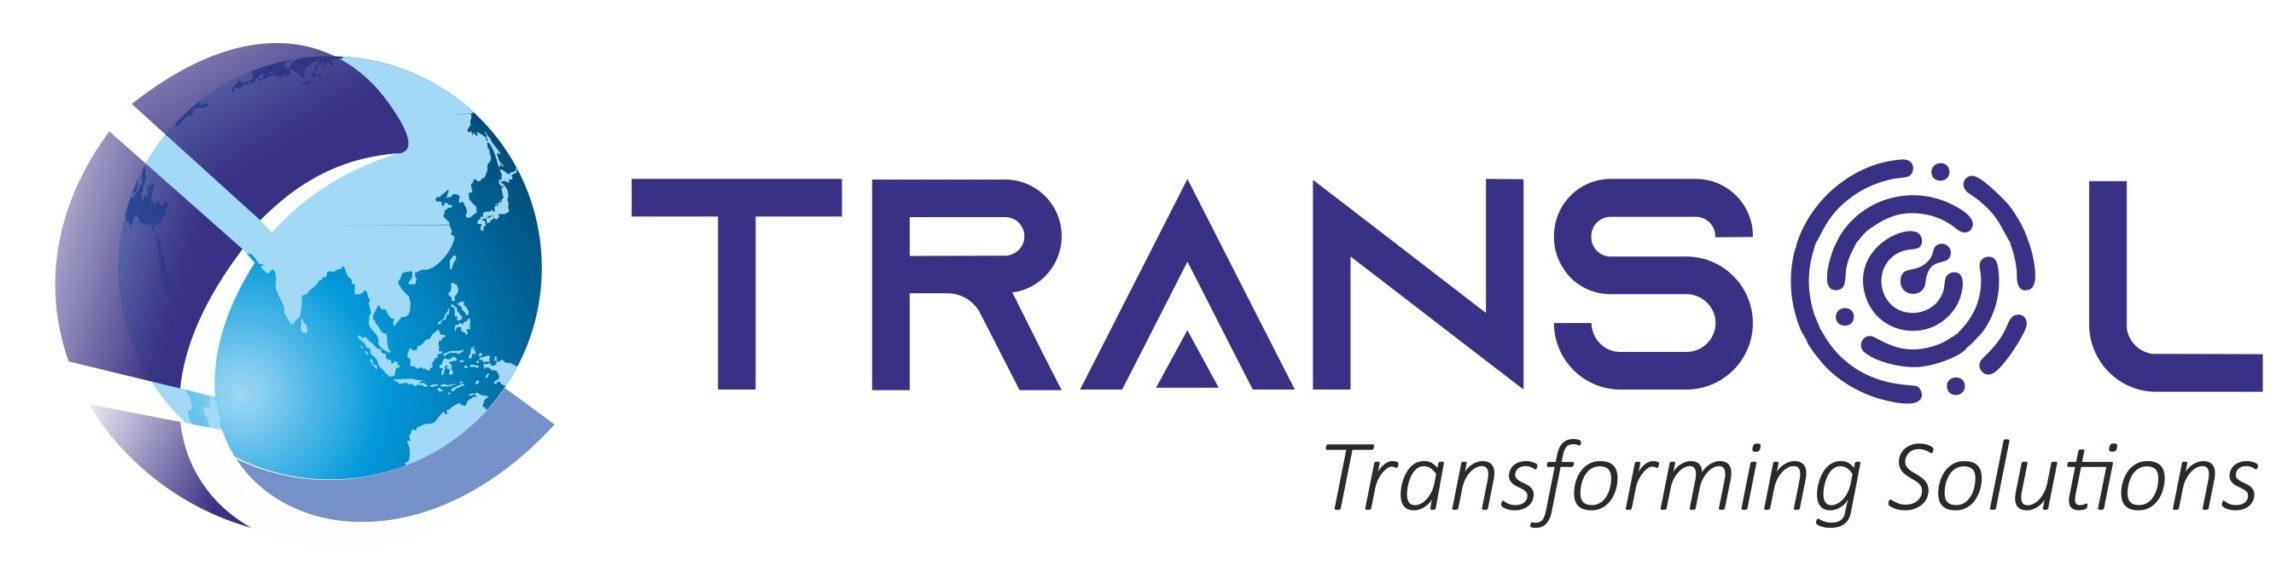 TranSol, Inc